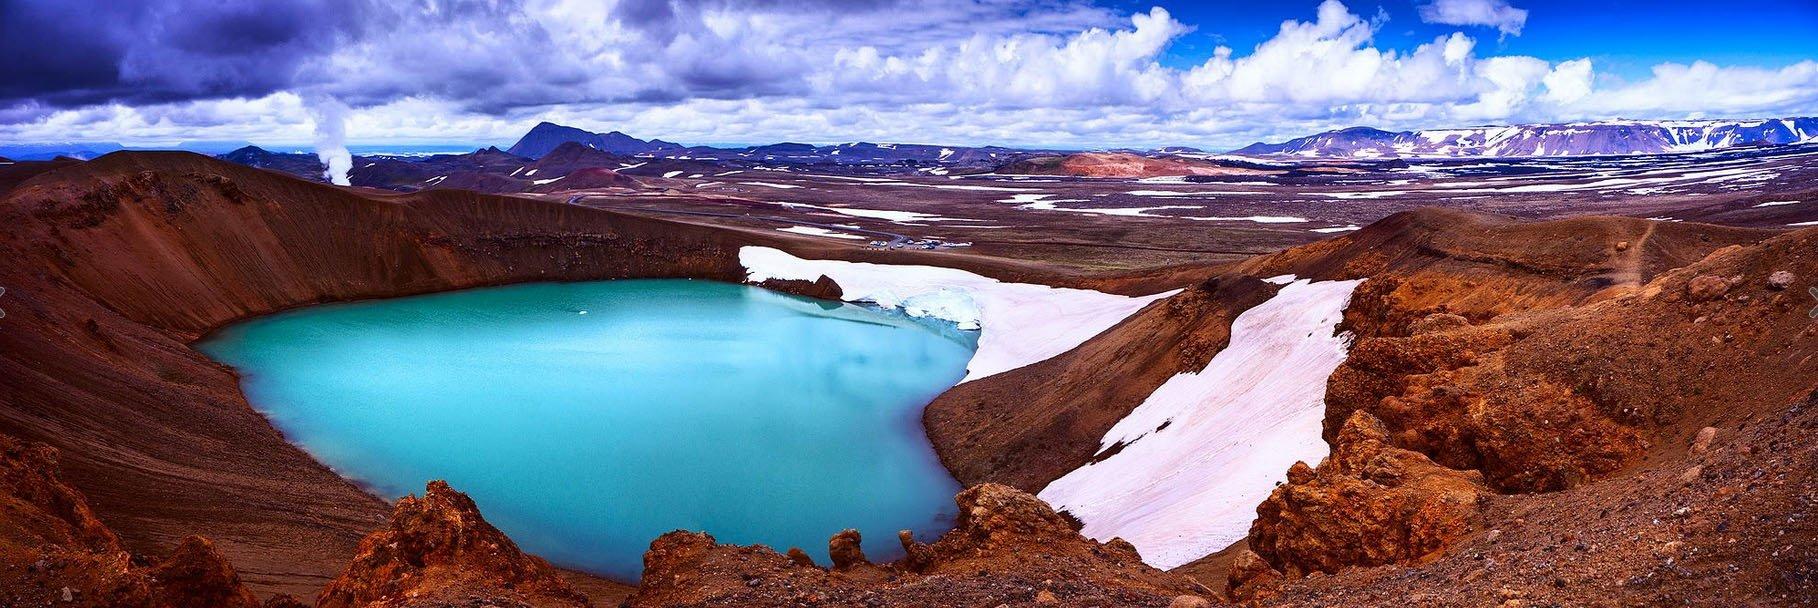 fotos para amar a Islândia cratera krafla viti